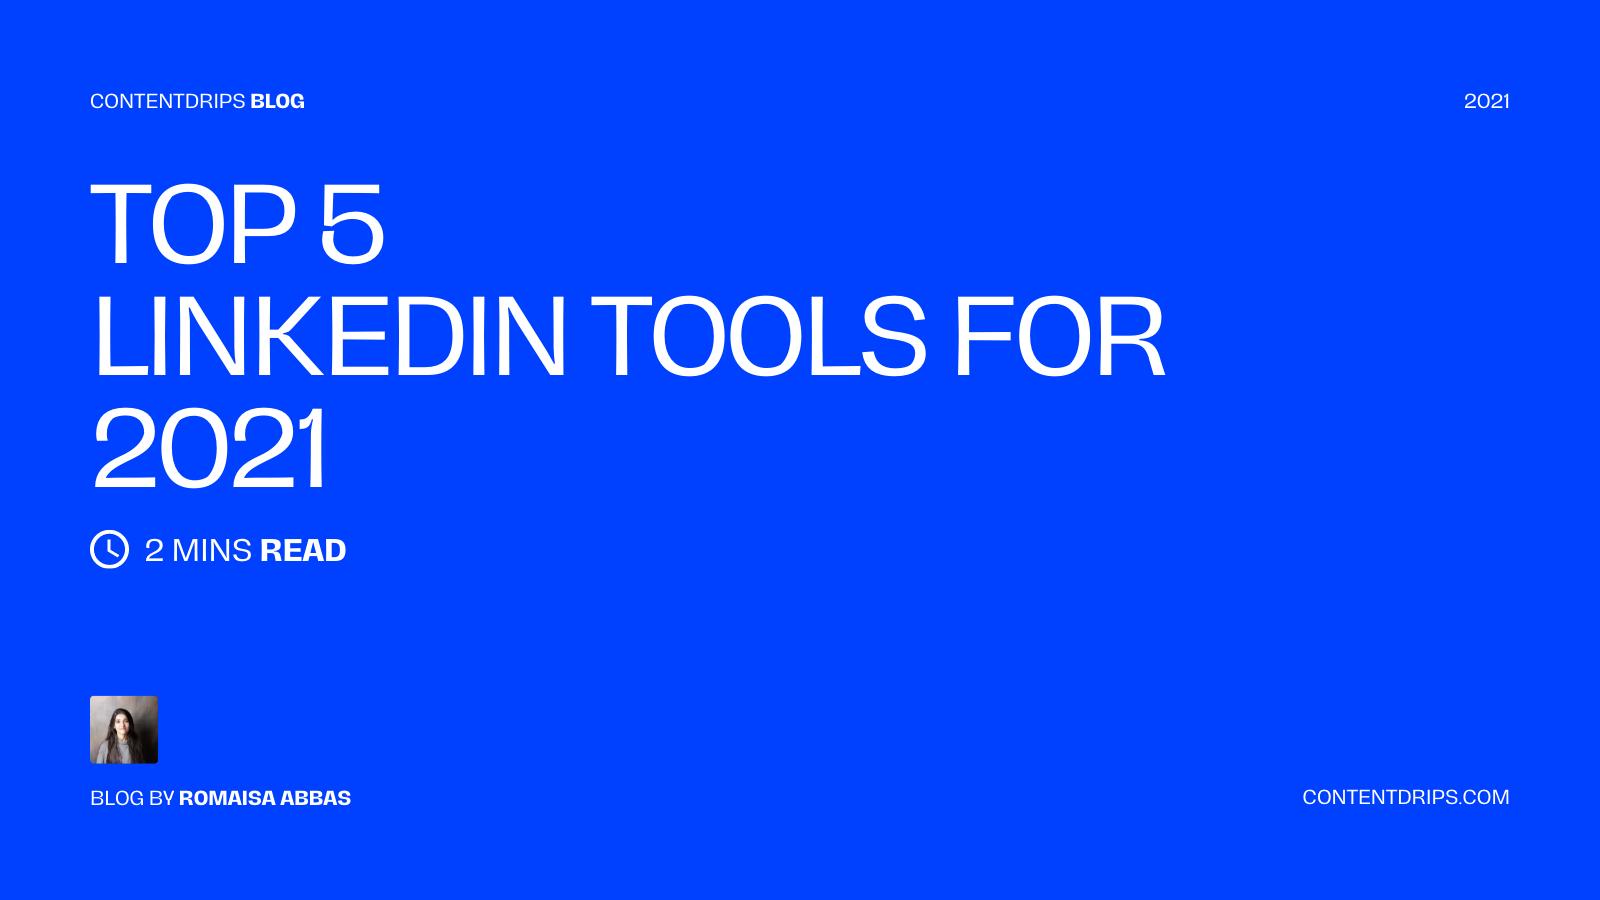 Top 5 LinkedIn Tools for 2021